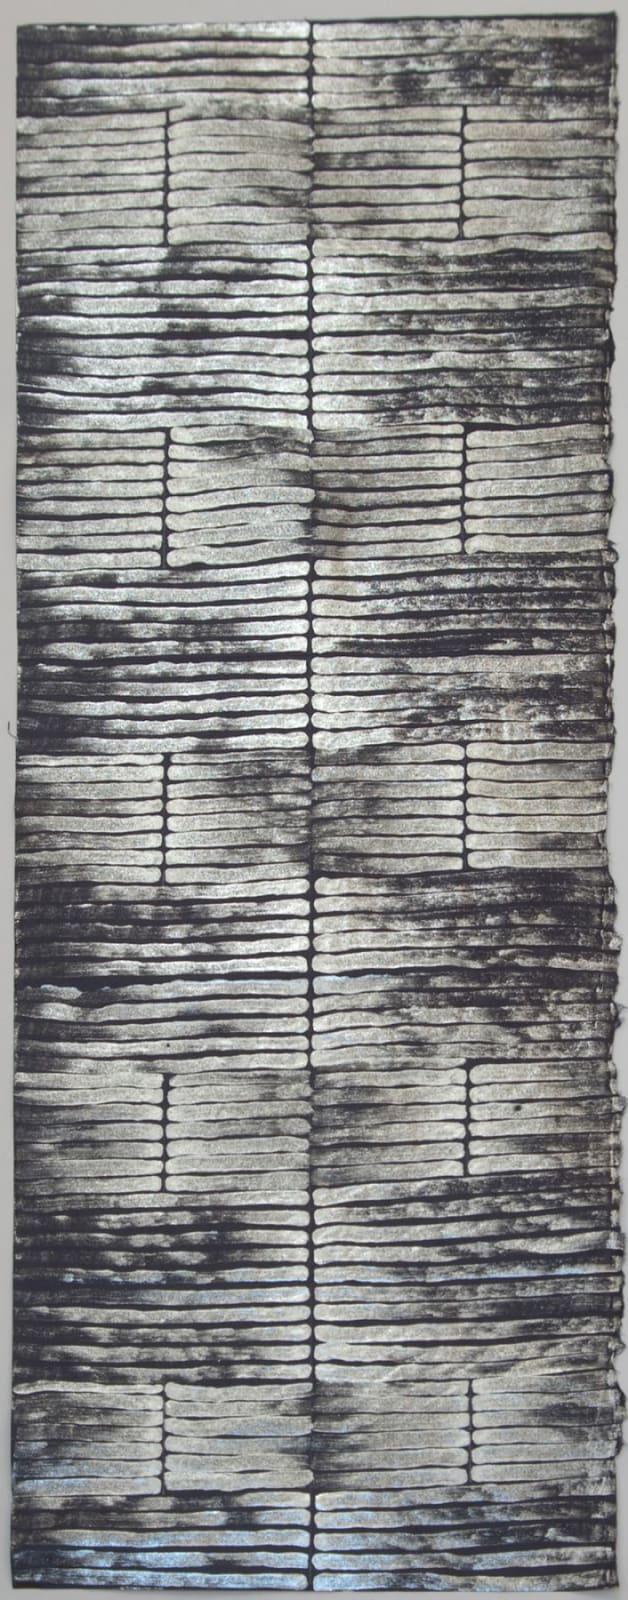 Huguette Caland, Untitled, 2001